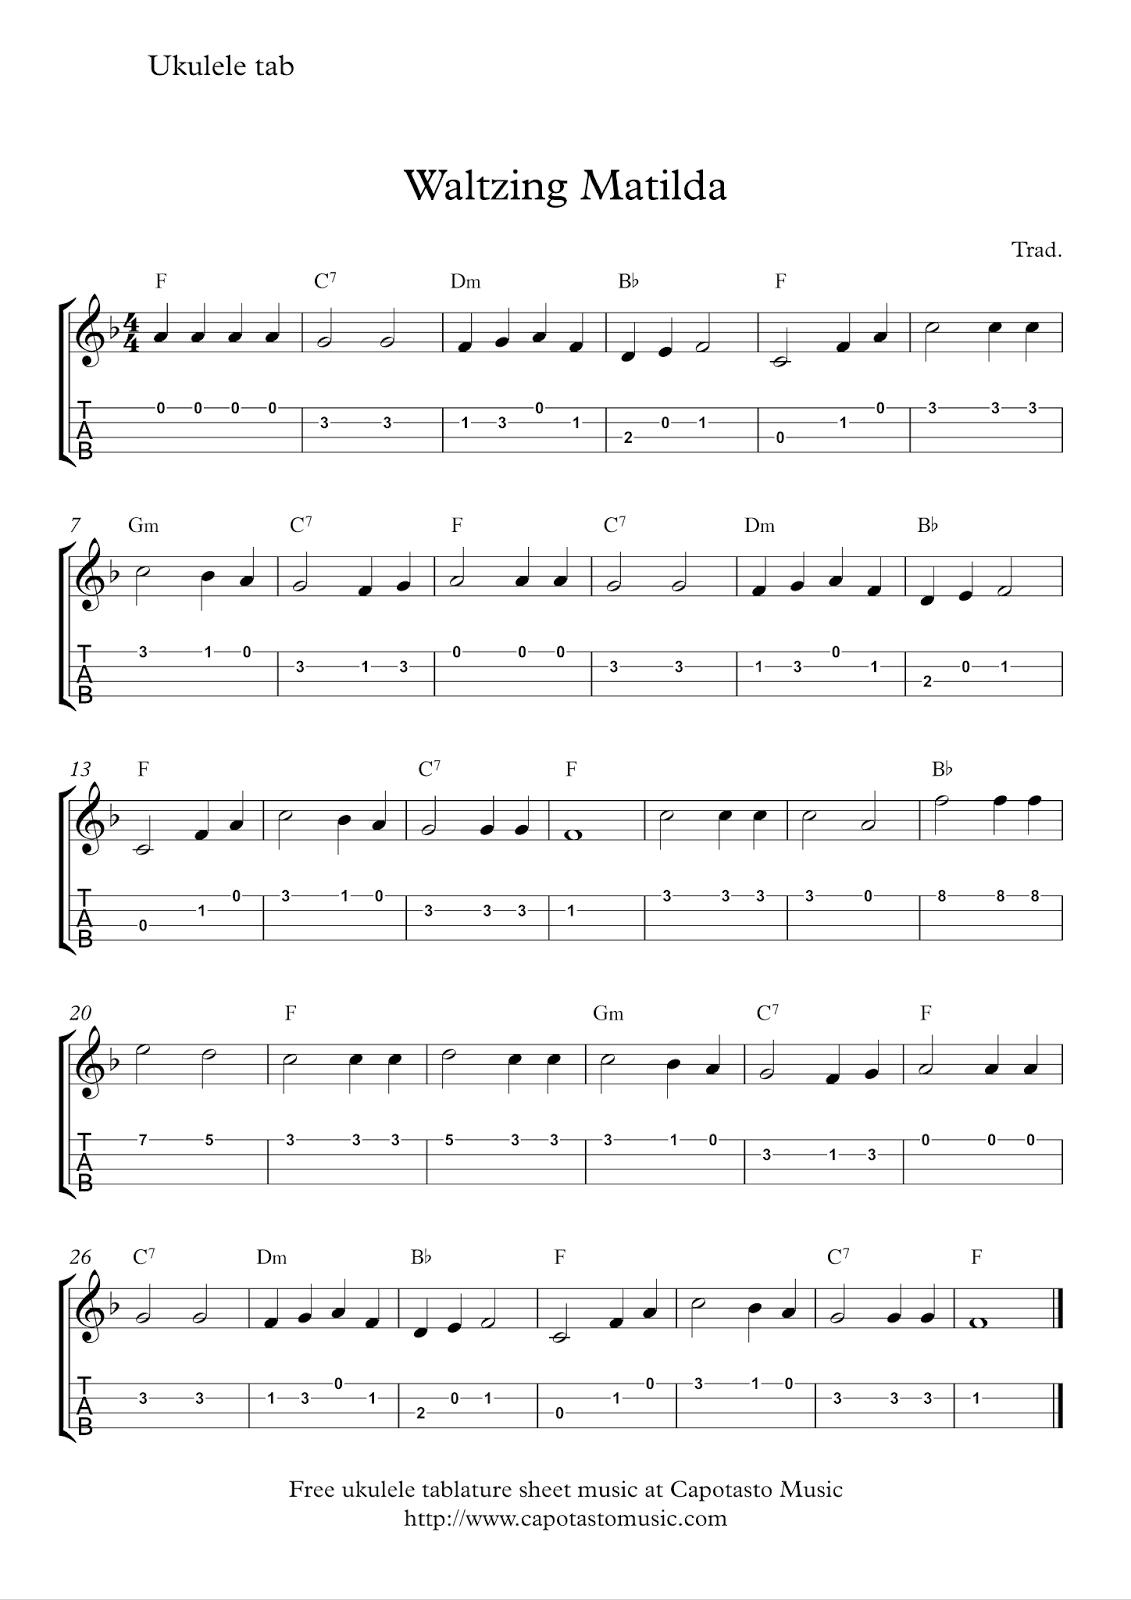 Free Sheet Music Scores Free Ukulele Tab Sheet Music